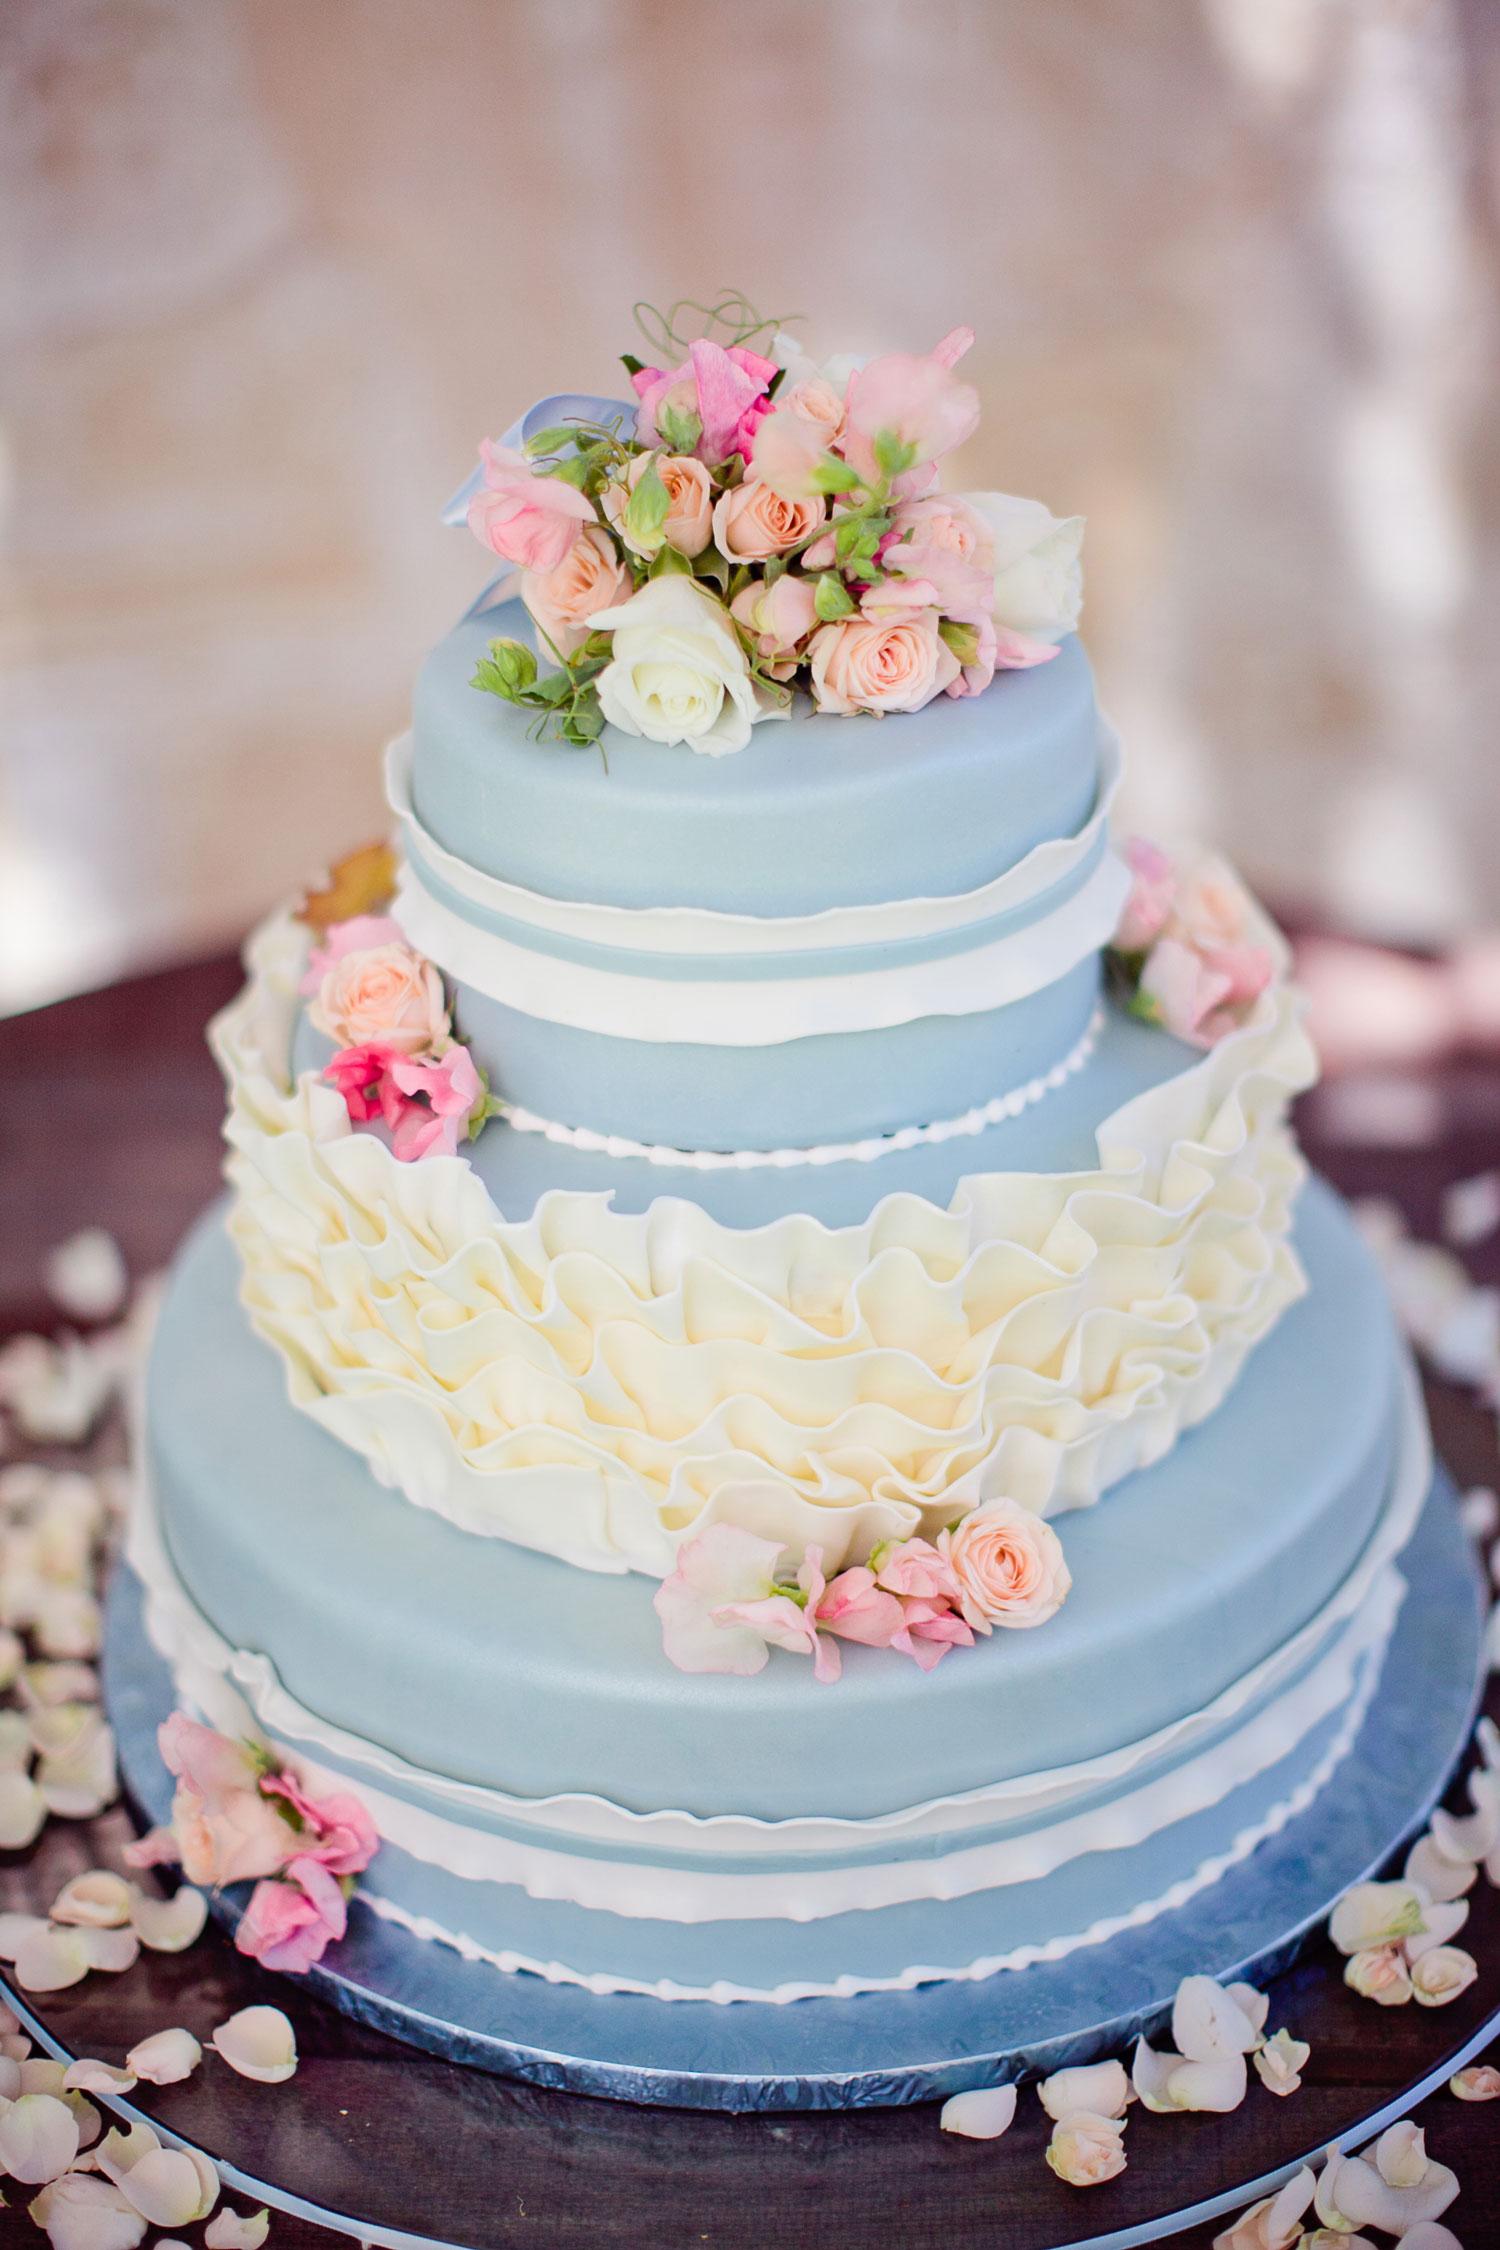 Wedding Ideas: Cake Ideas for Every Style - Inside Weddings